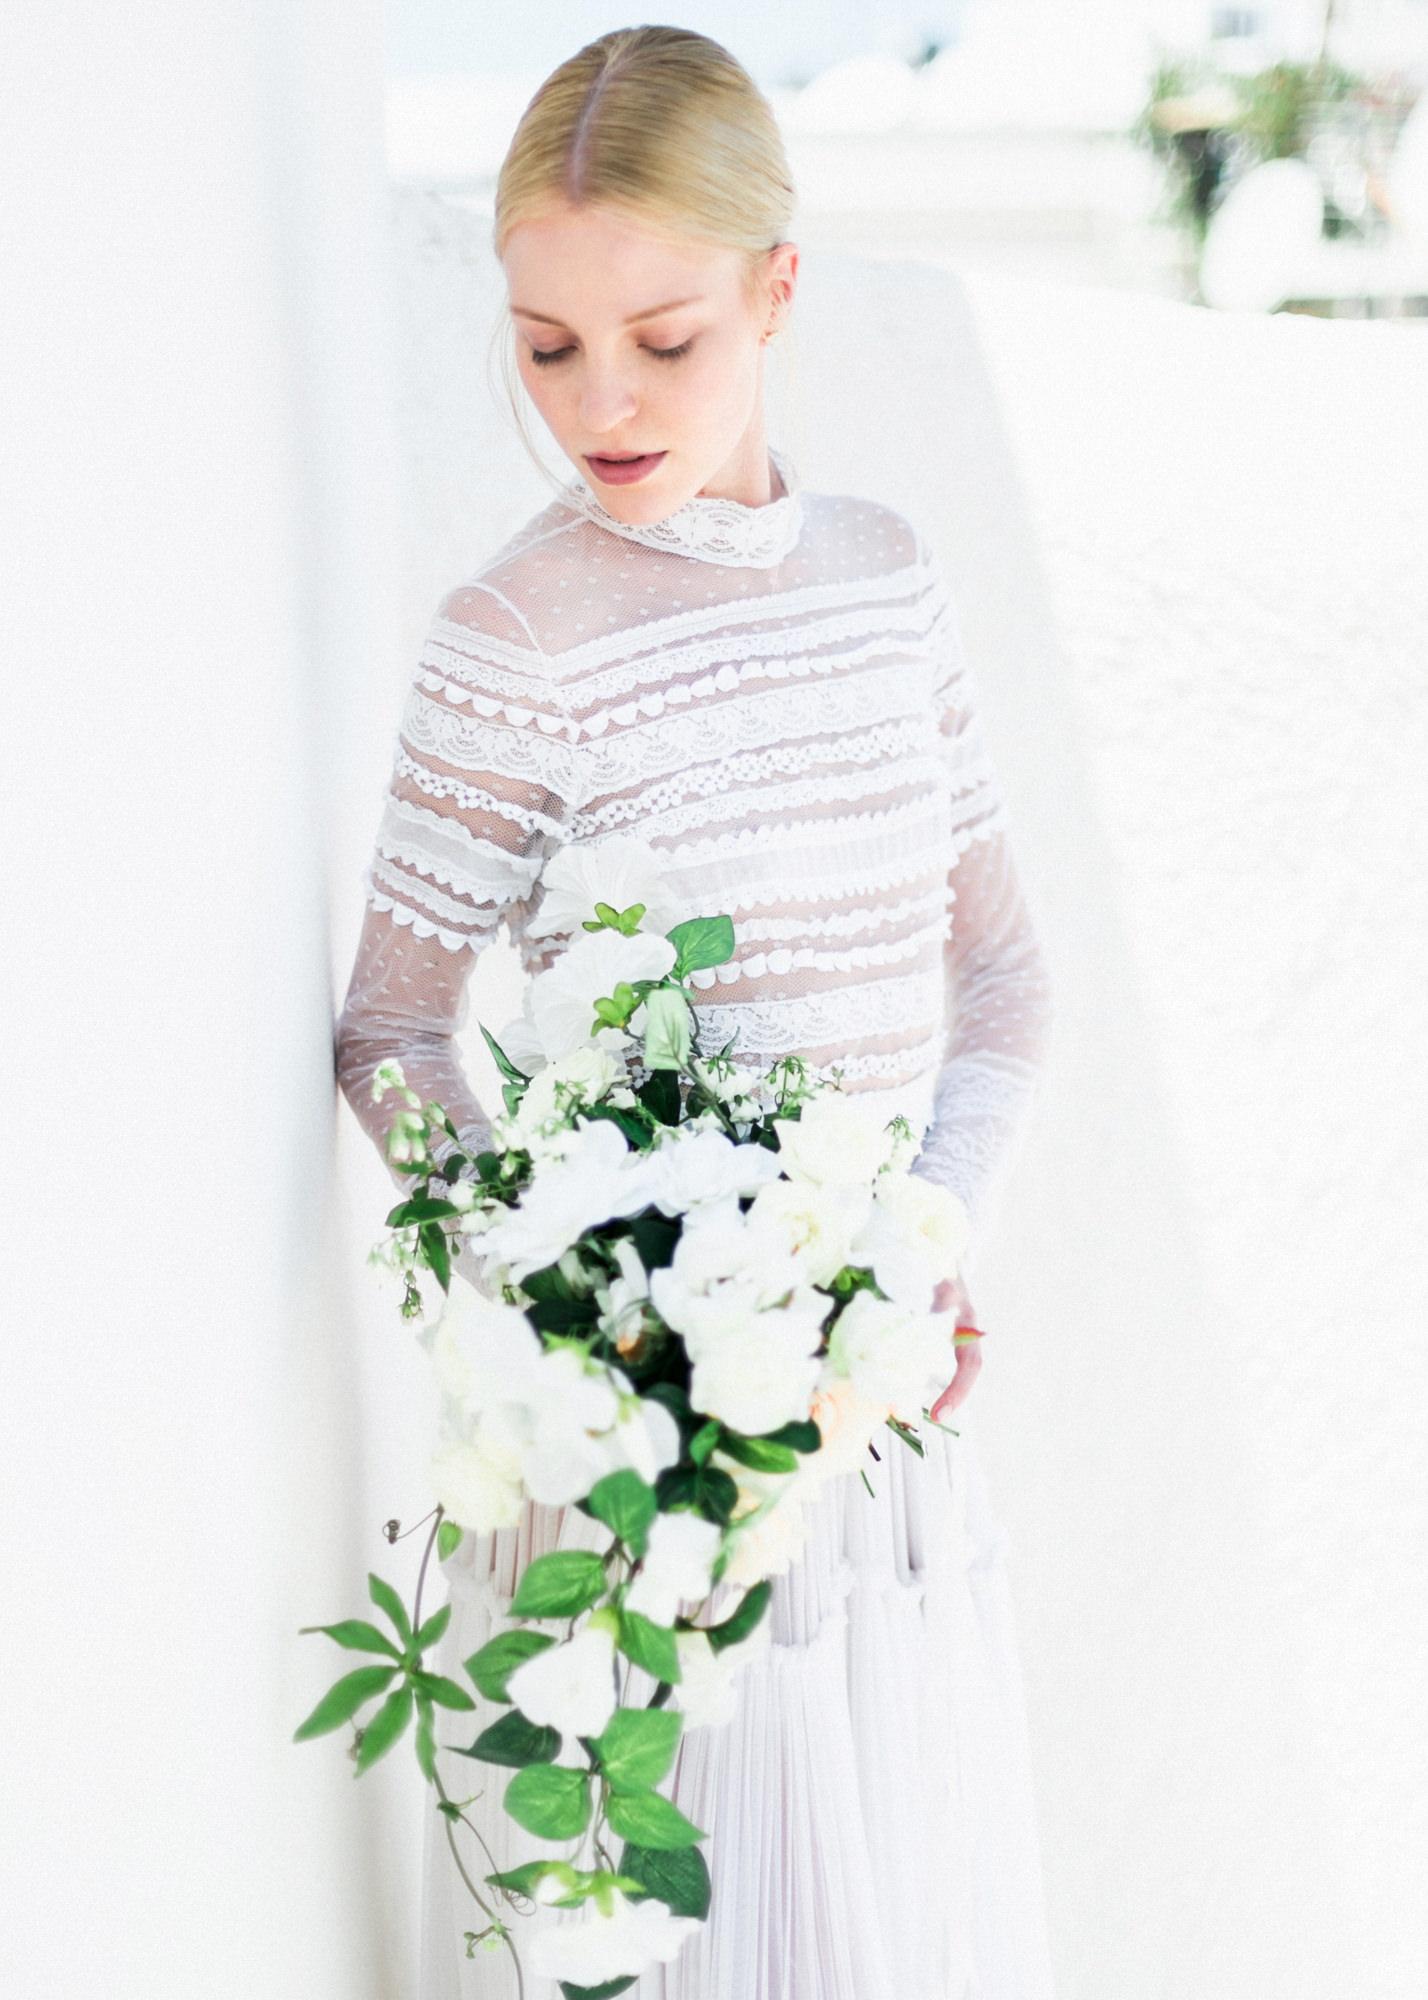 02-portrait-santorini-wedding-photographer-greece-b-v